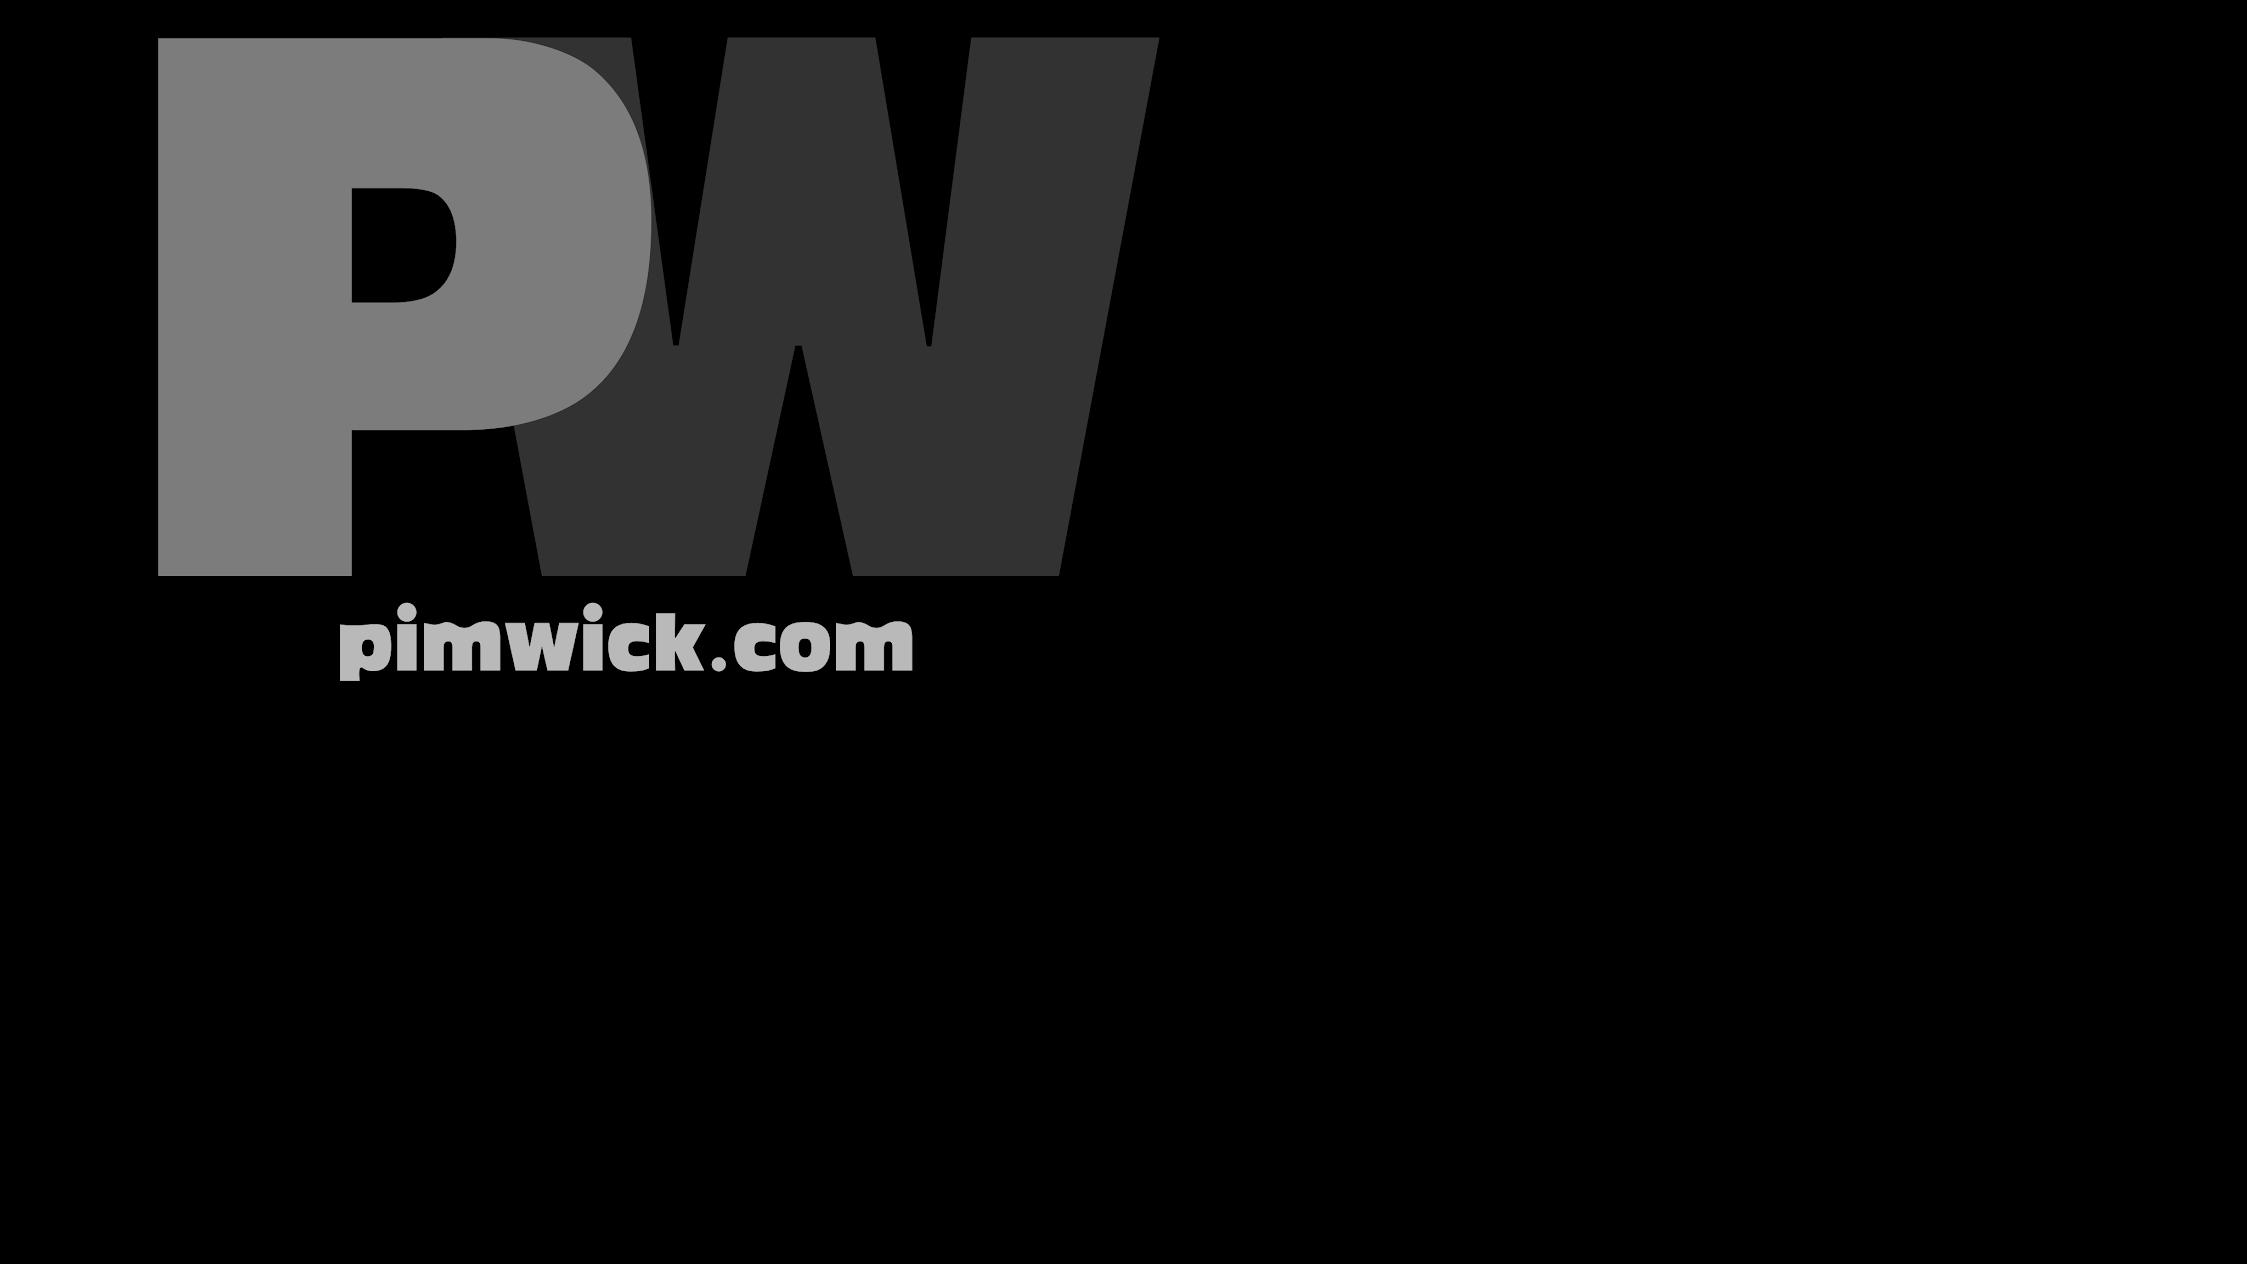 Pimwick, LLC